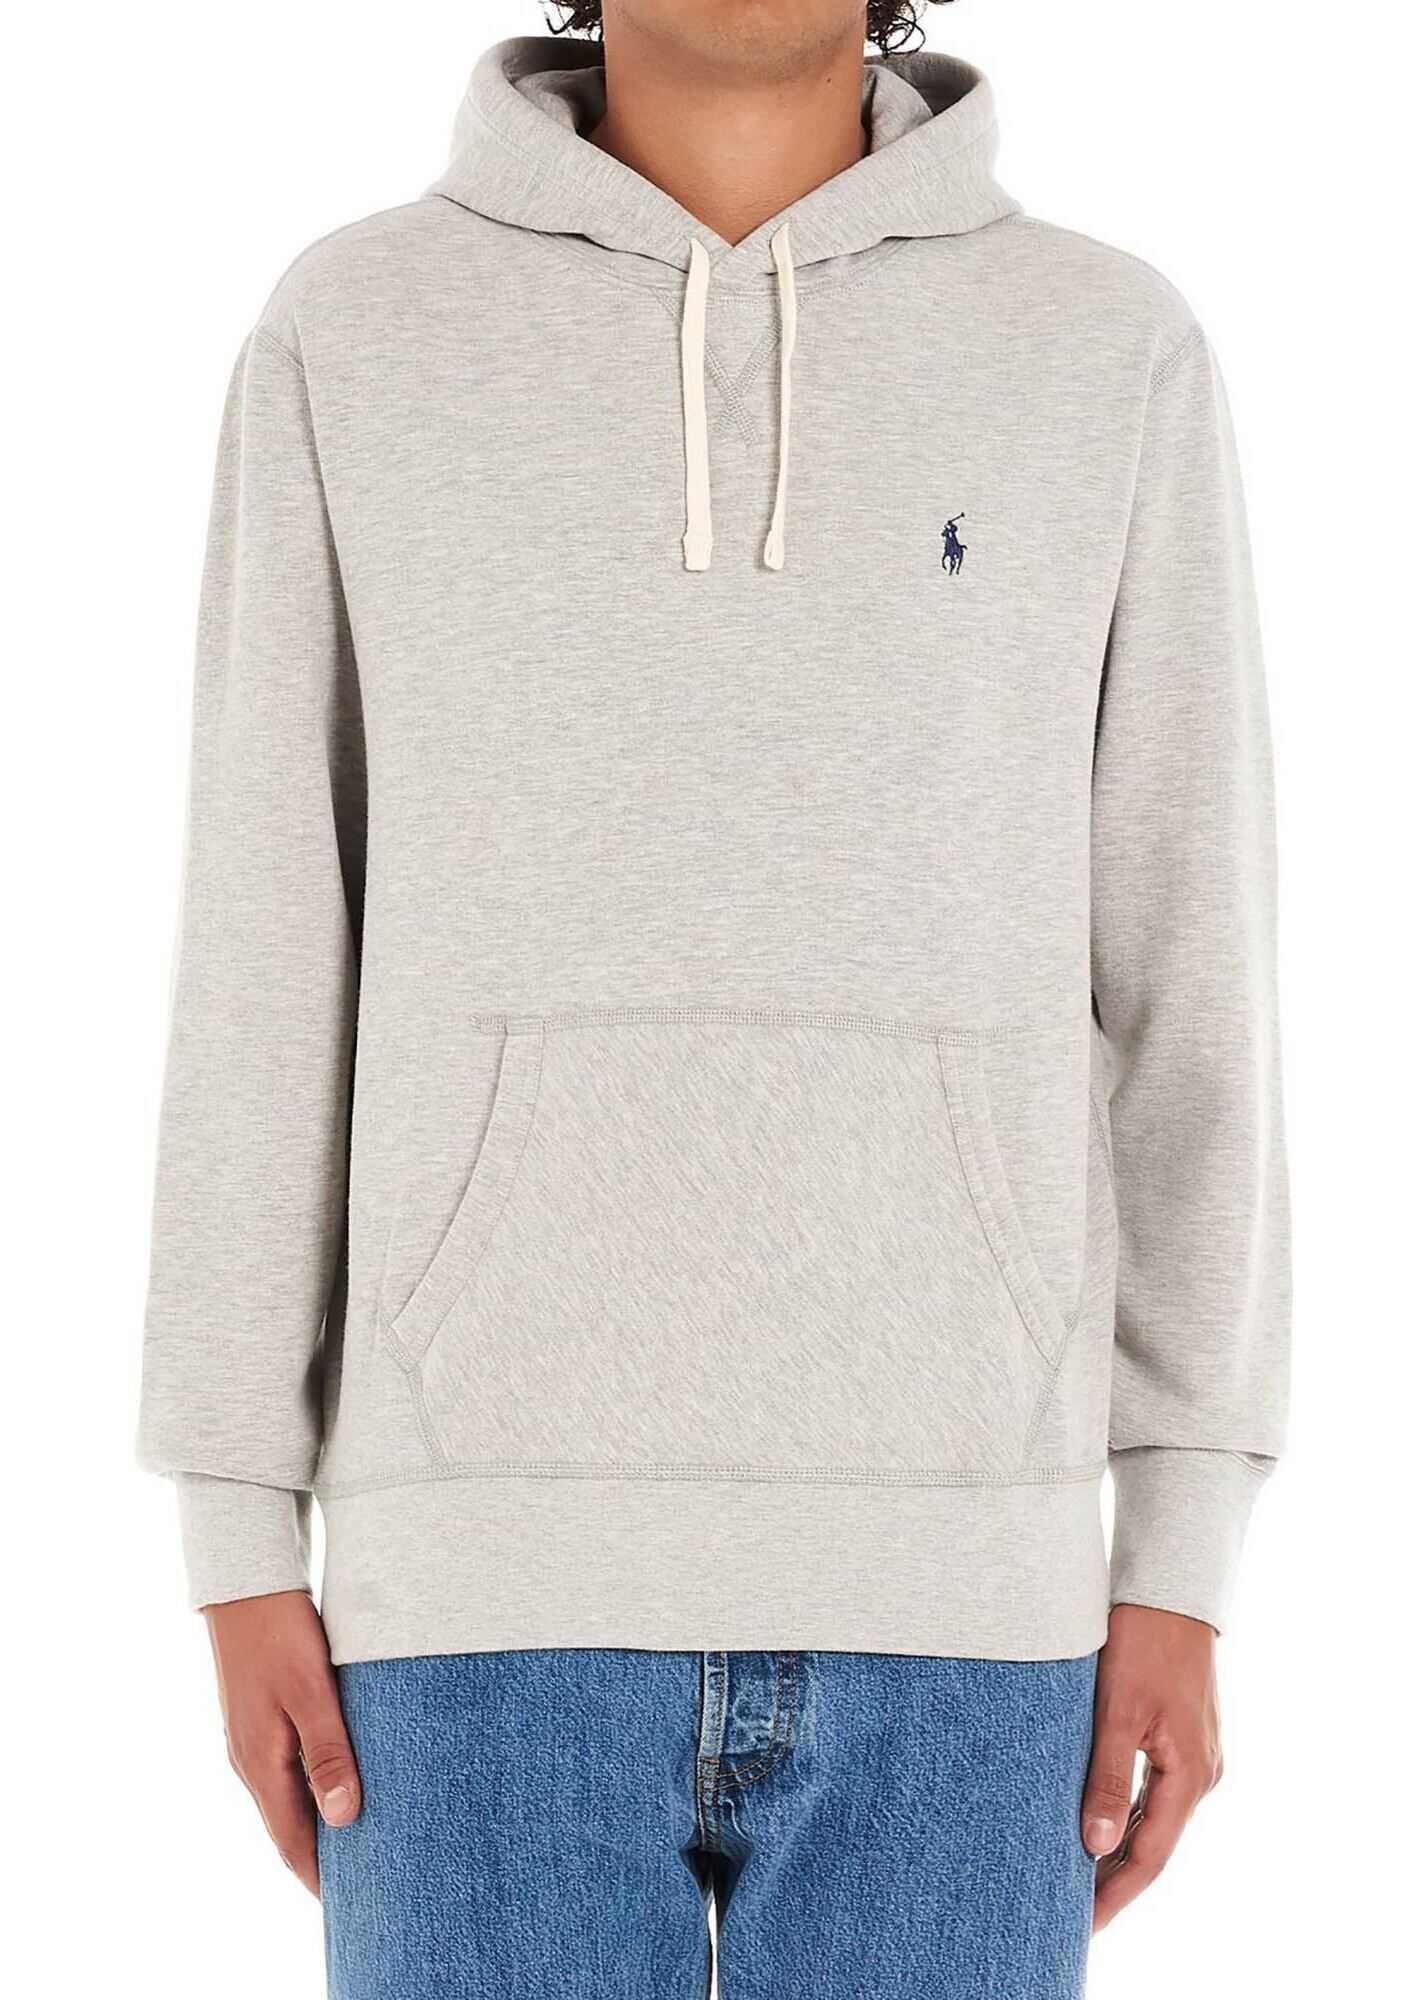 Ralph Lauren Light Grey Sweatshirt With Logo Embroidery Grey imagine